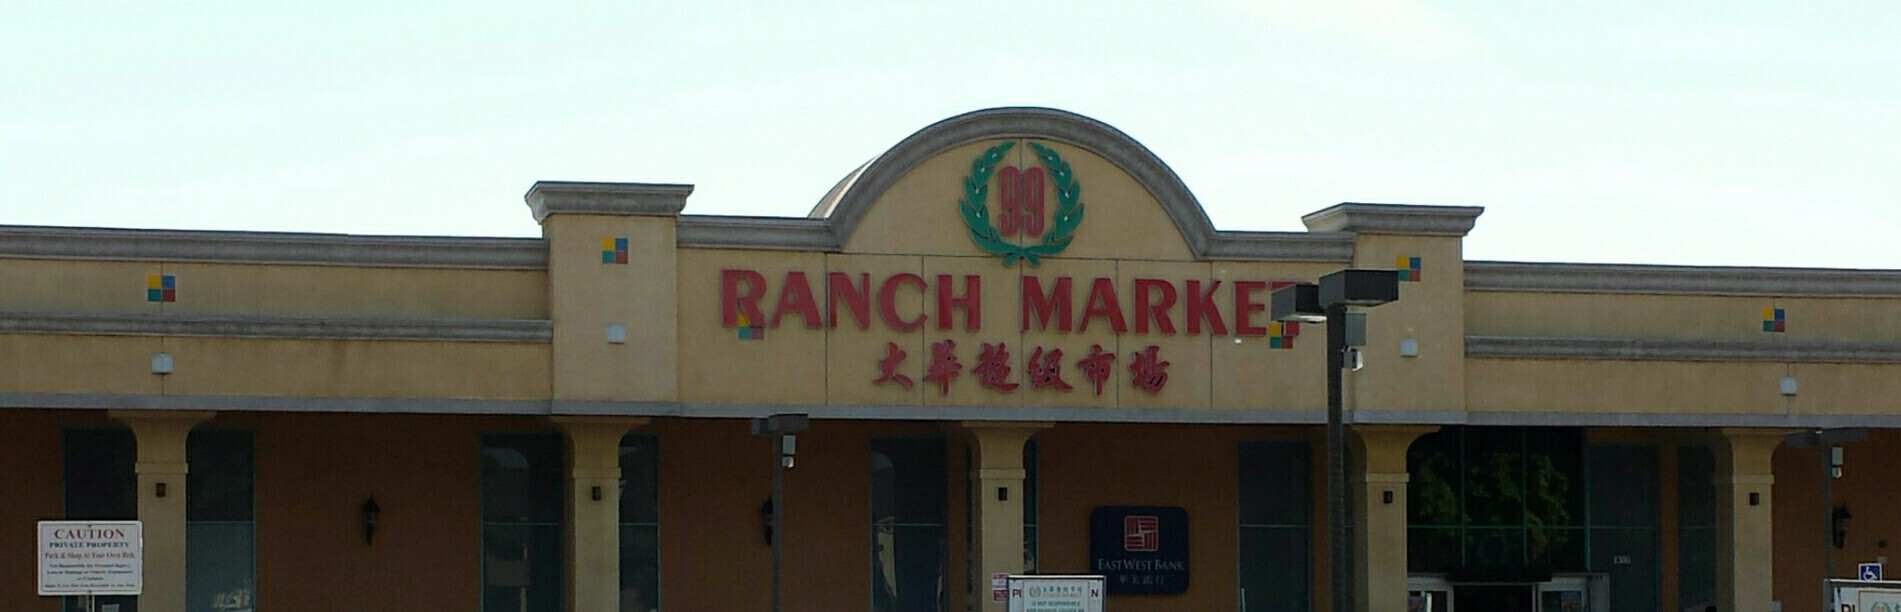 99 Ranch Market 1300 S Golden West Ave Arcadia CA 91007